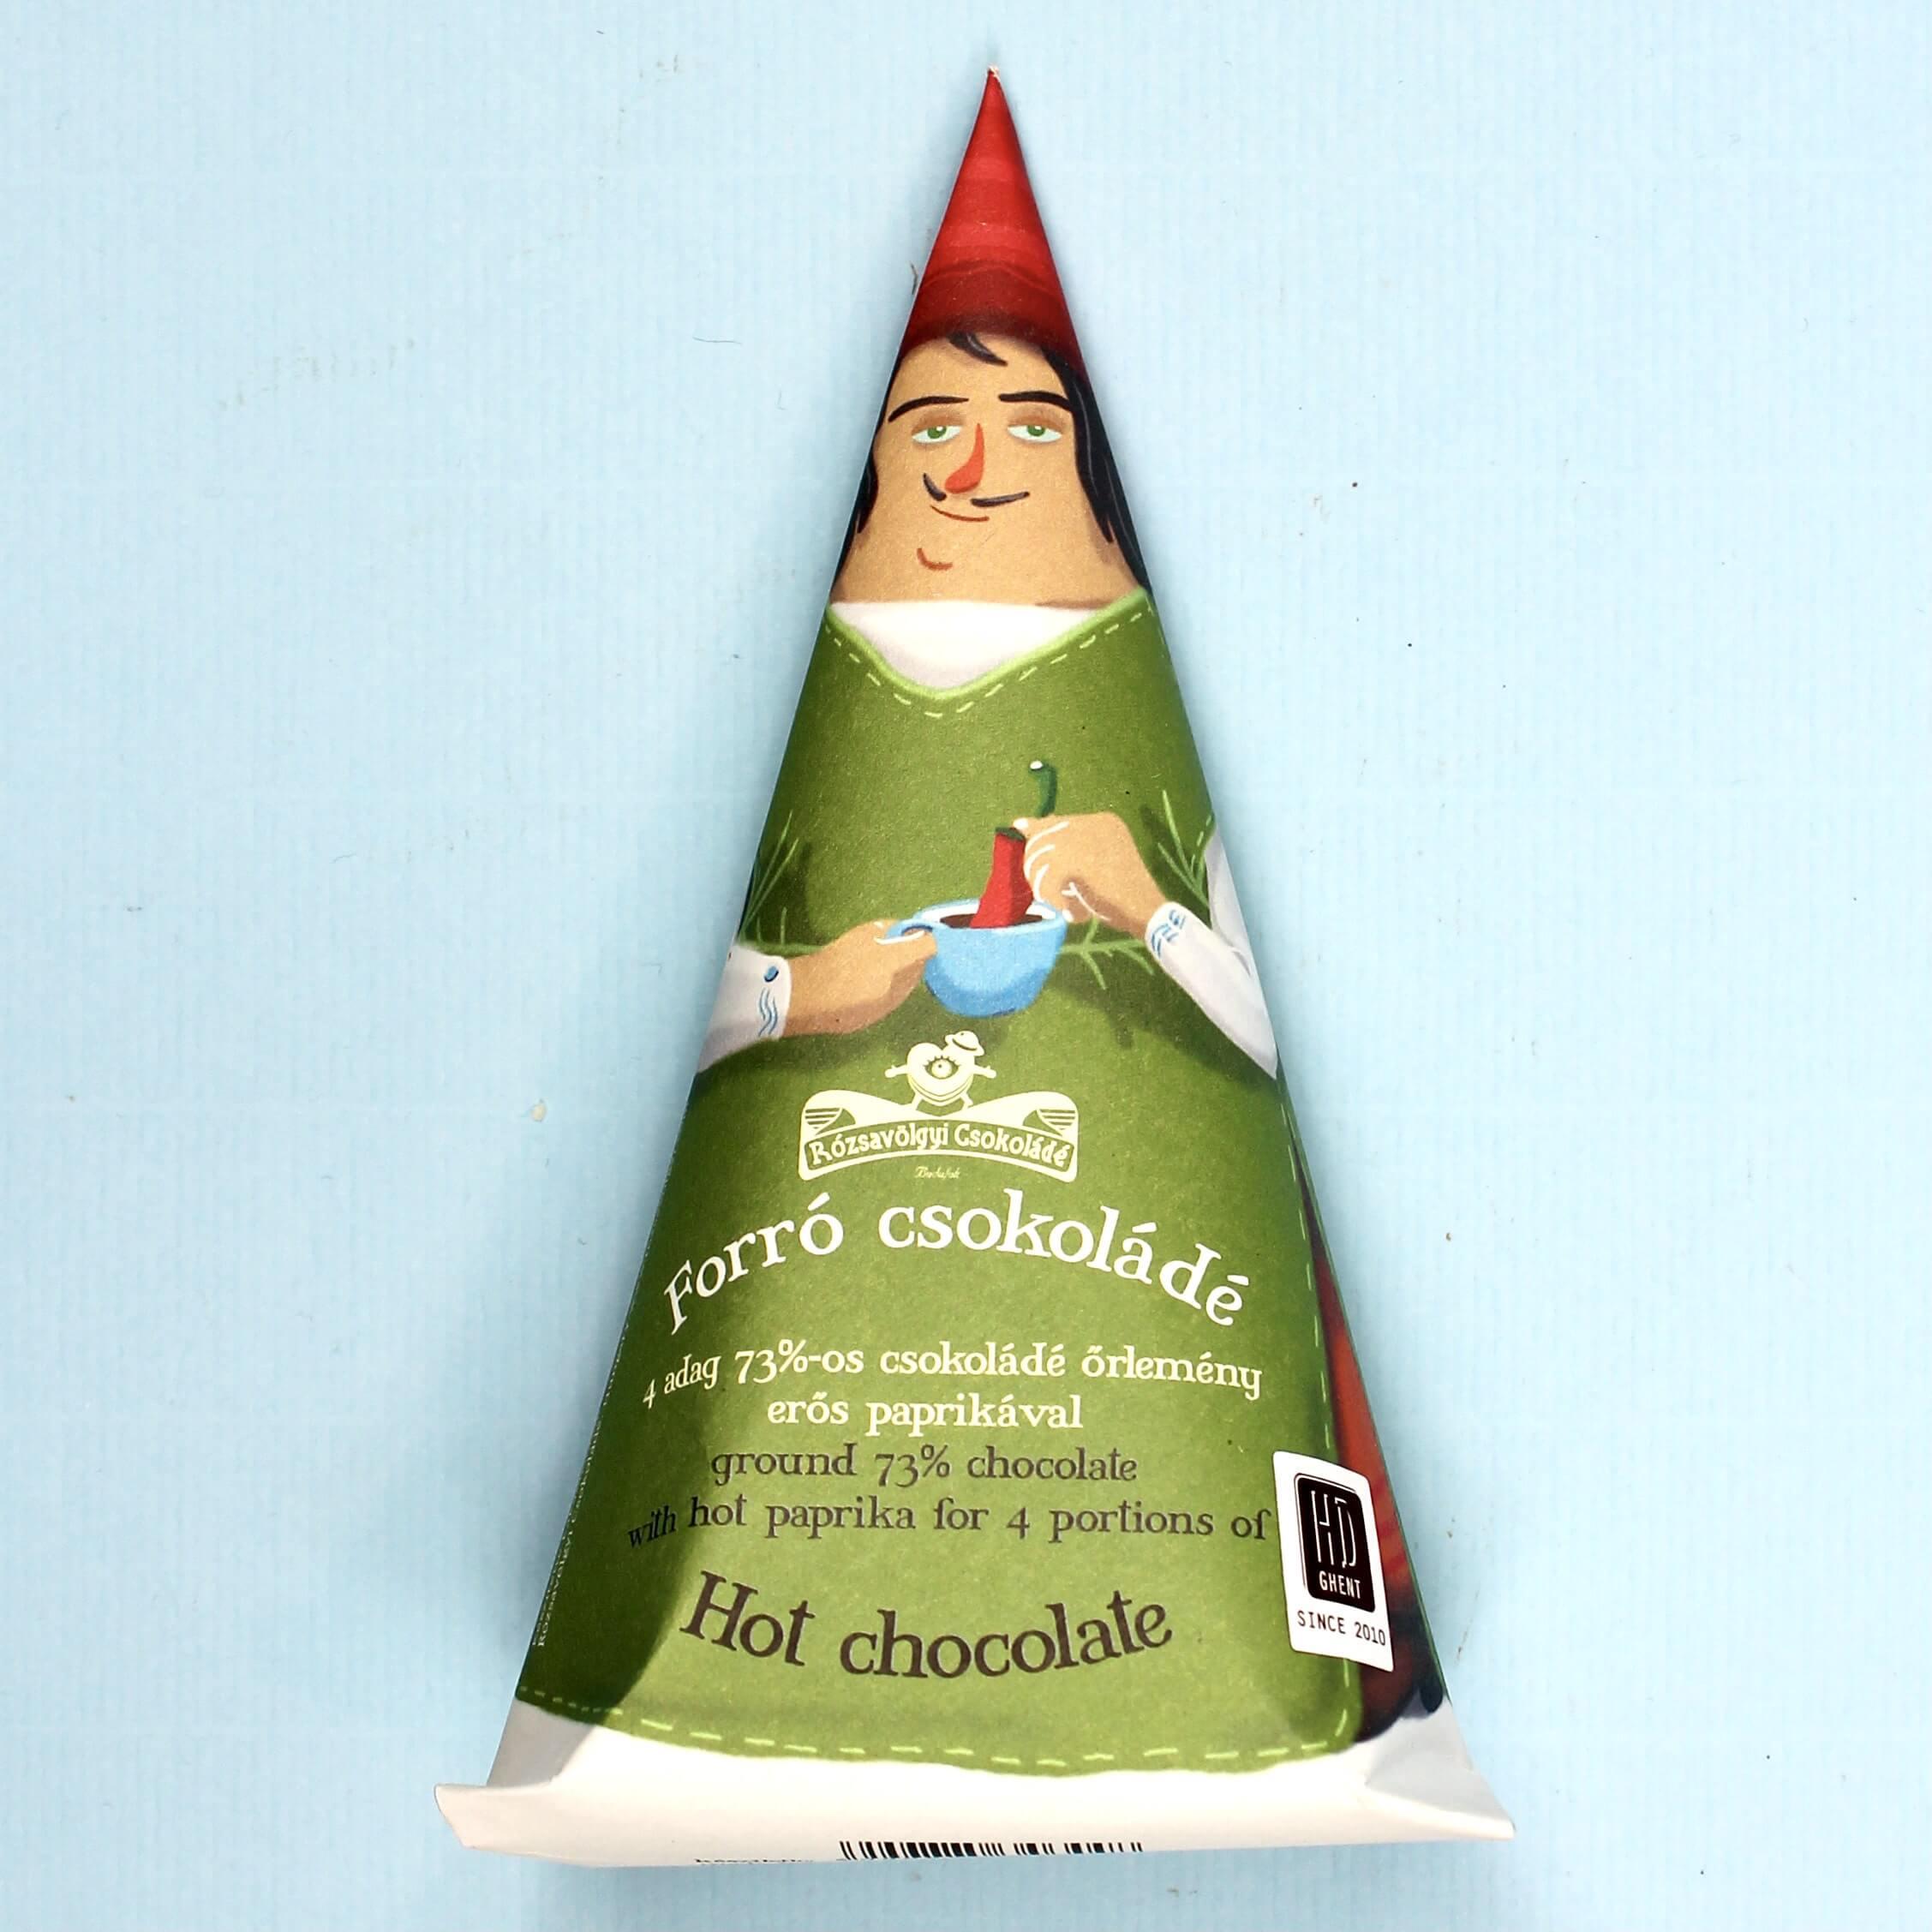 hd ghent rozsavolgyi csokolade hot chocolate hot paprika 73